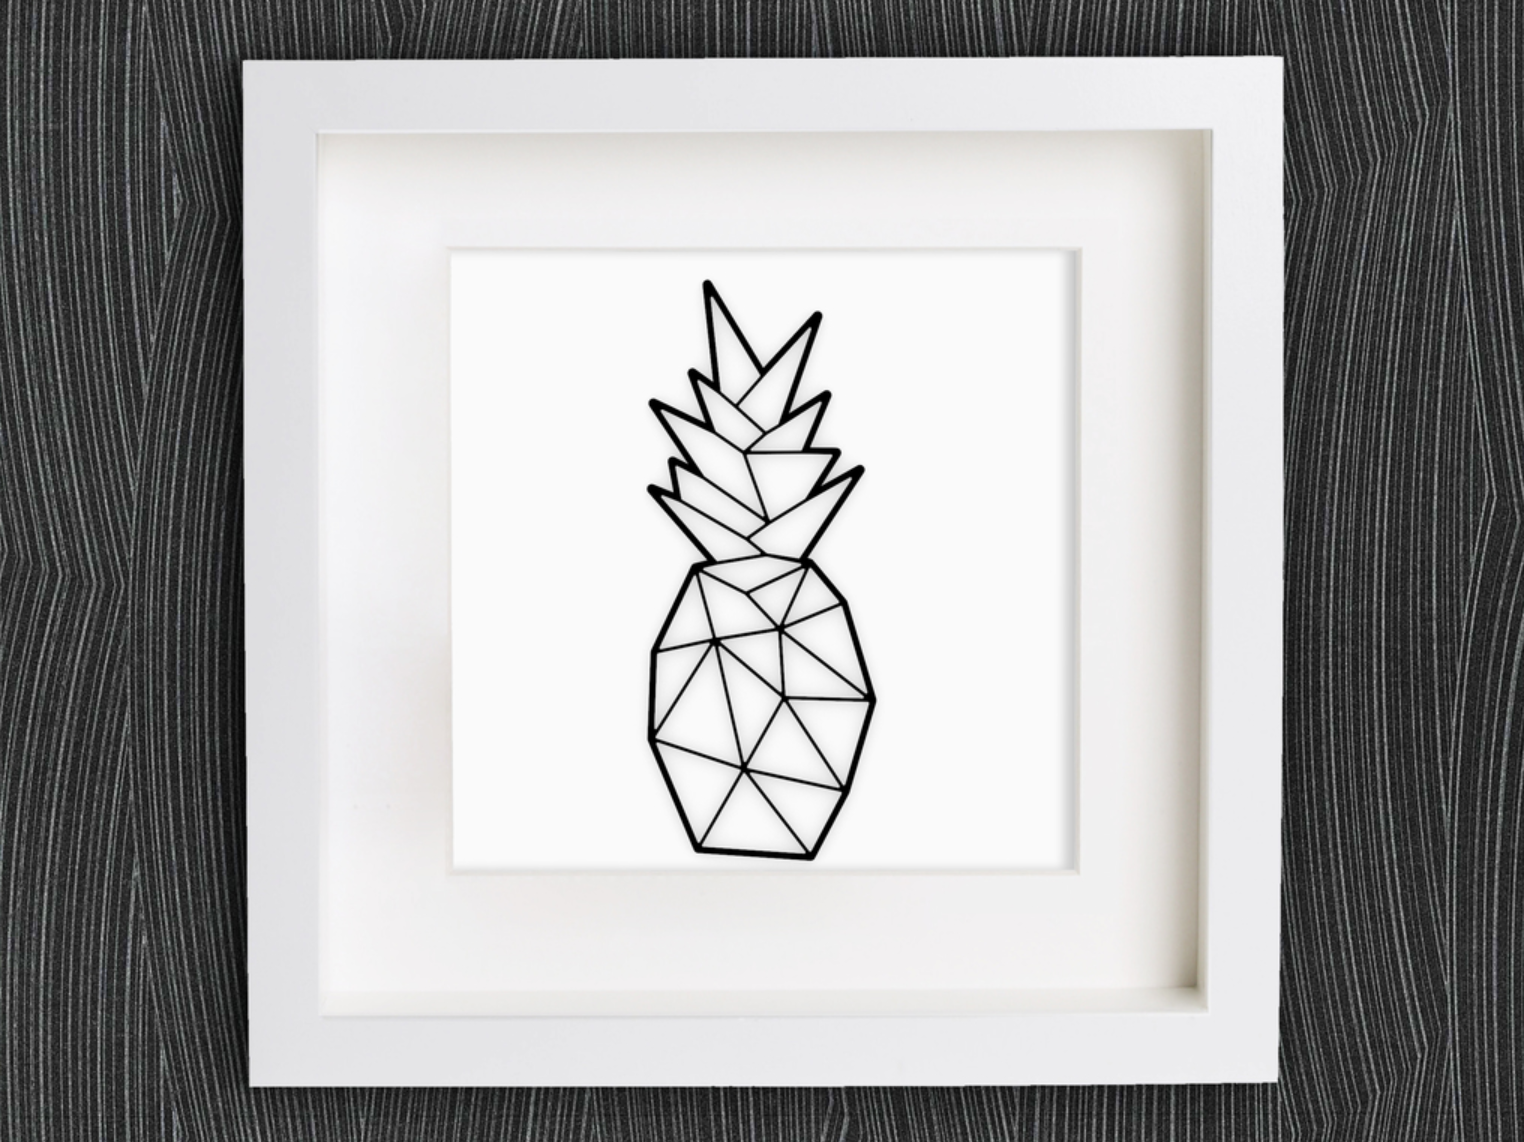 Capture d'écran 2017-12-26 à 12.17.06.png Download free STL file Customizable Origami Pineapple • 3D printable design, MightyNozzle